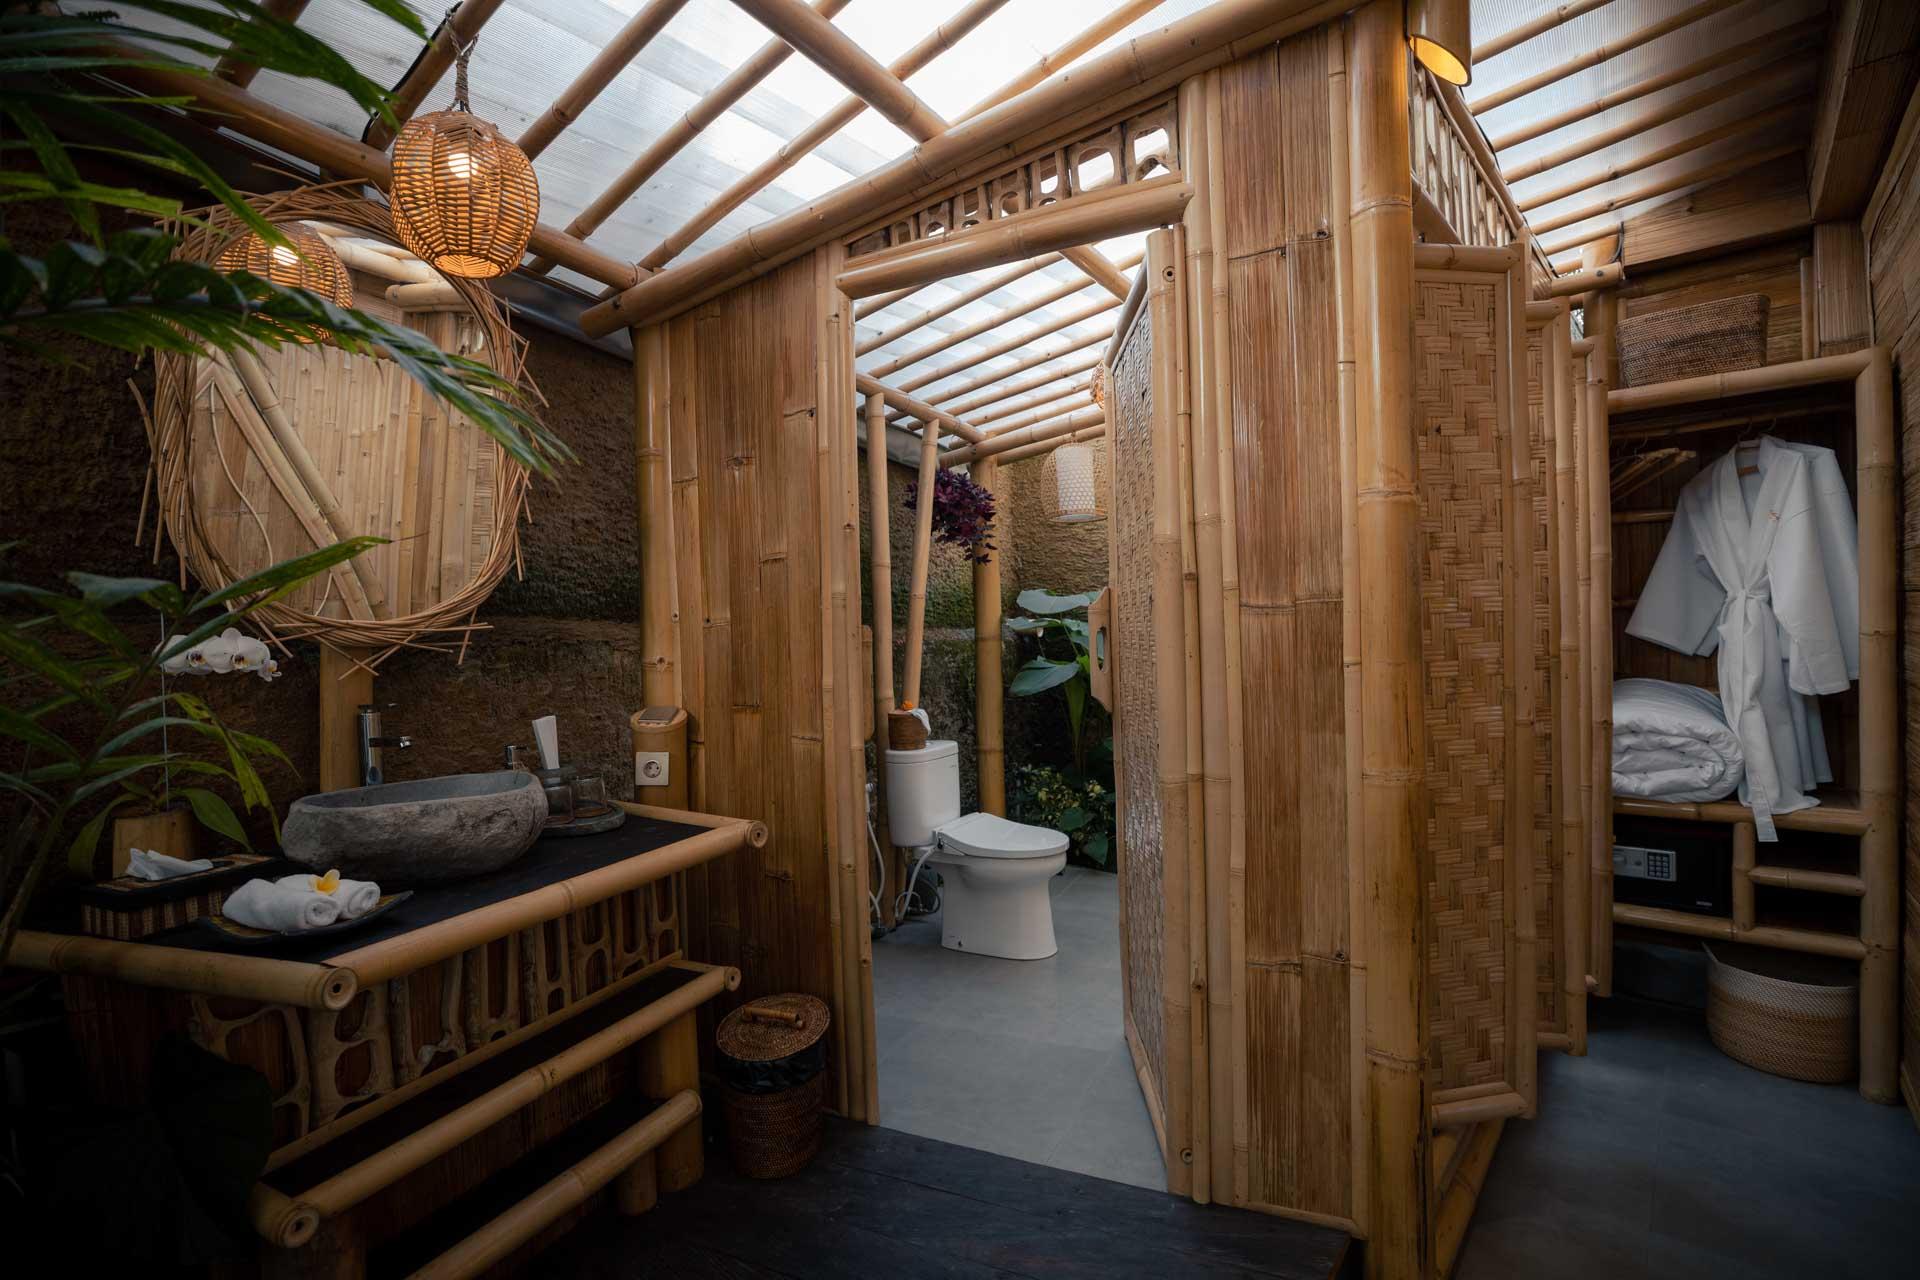 magic hills bali, magical hills bamboo house